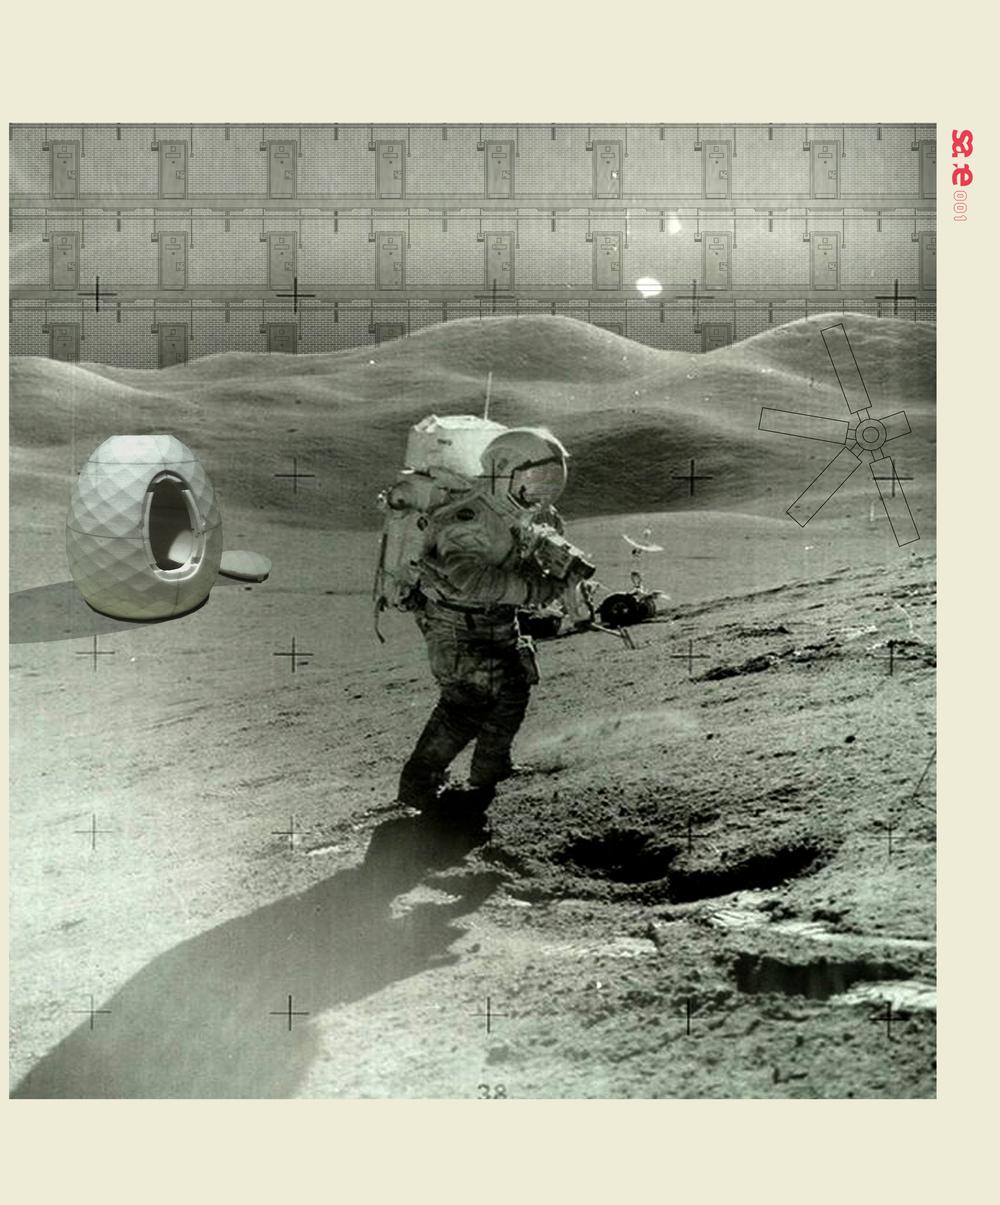 on the moon2.jpg